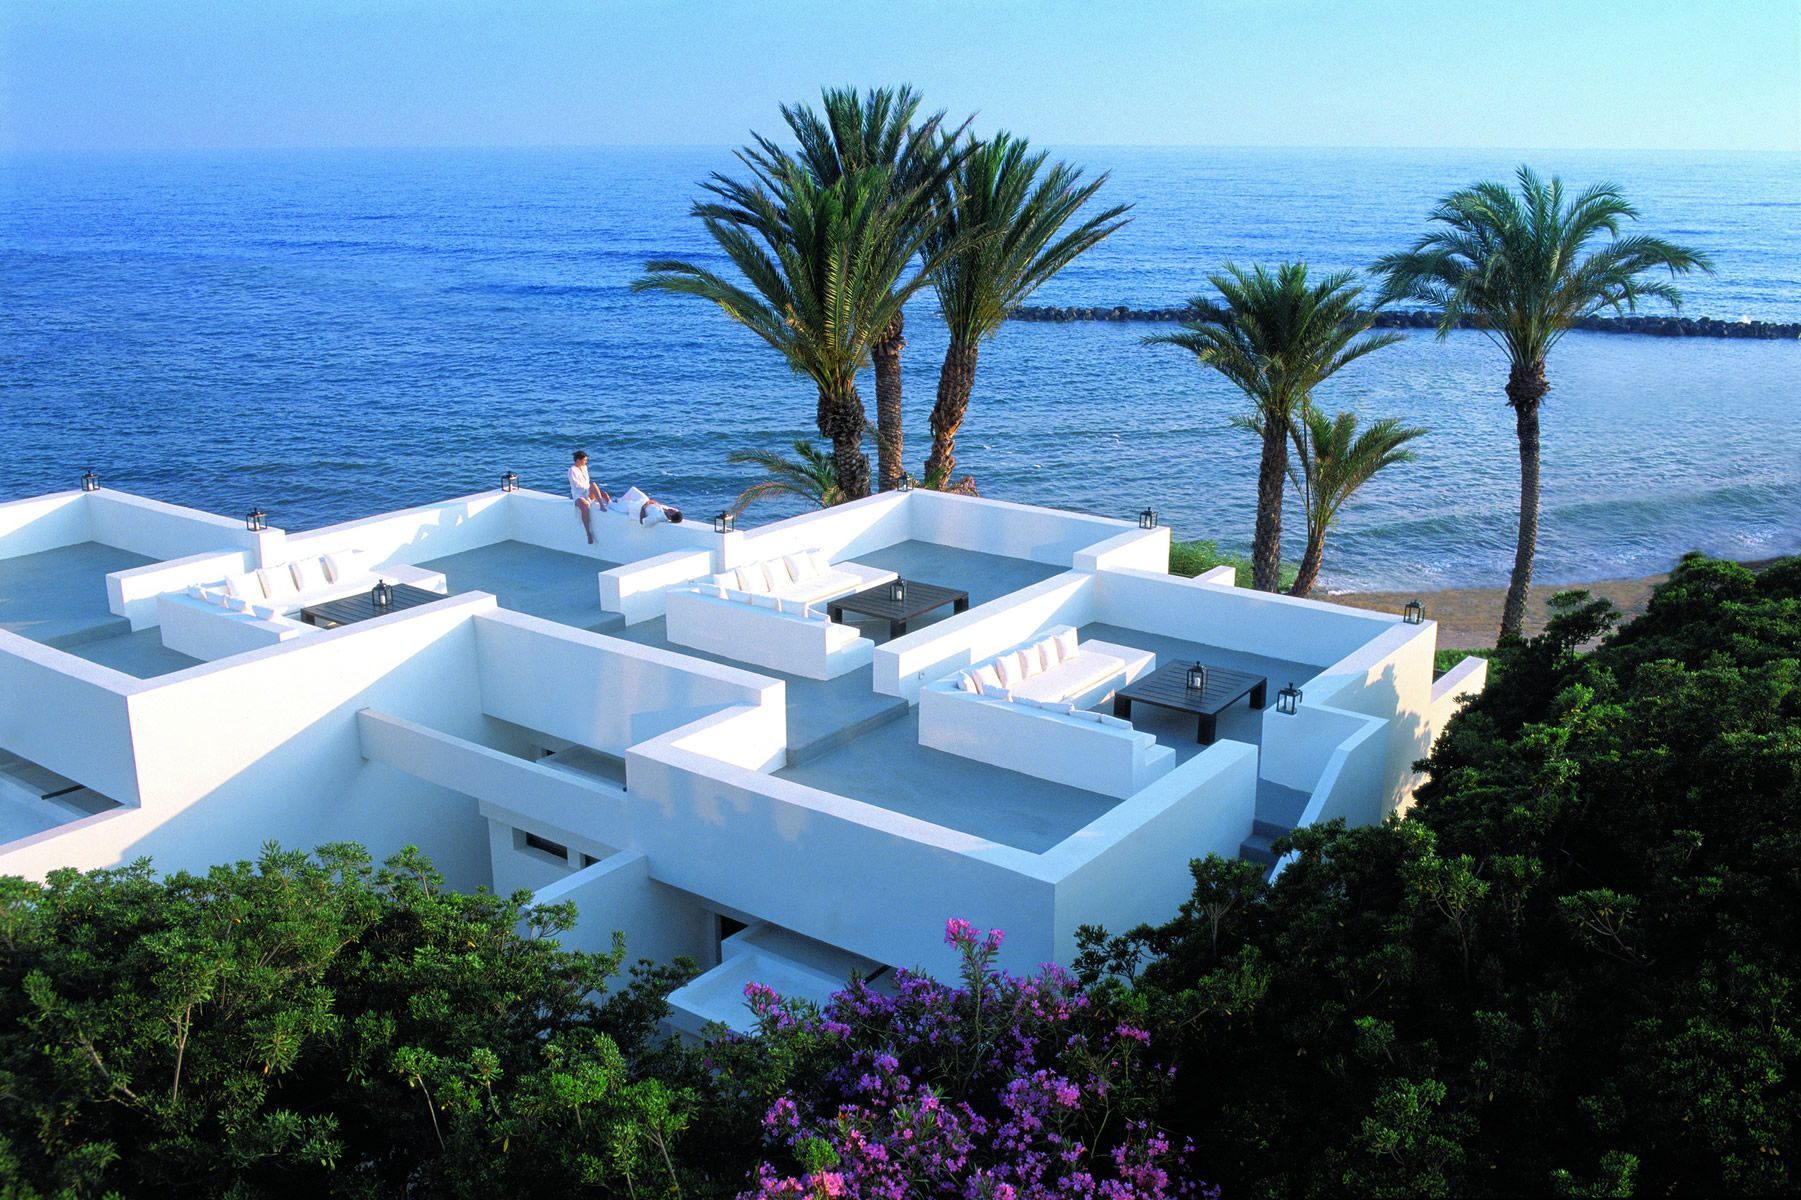 Babymoon at the five-star Almyra – Cyprus